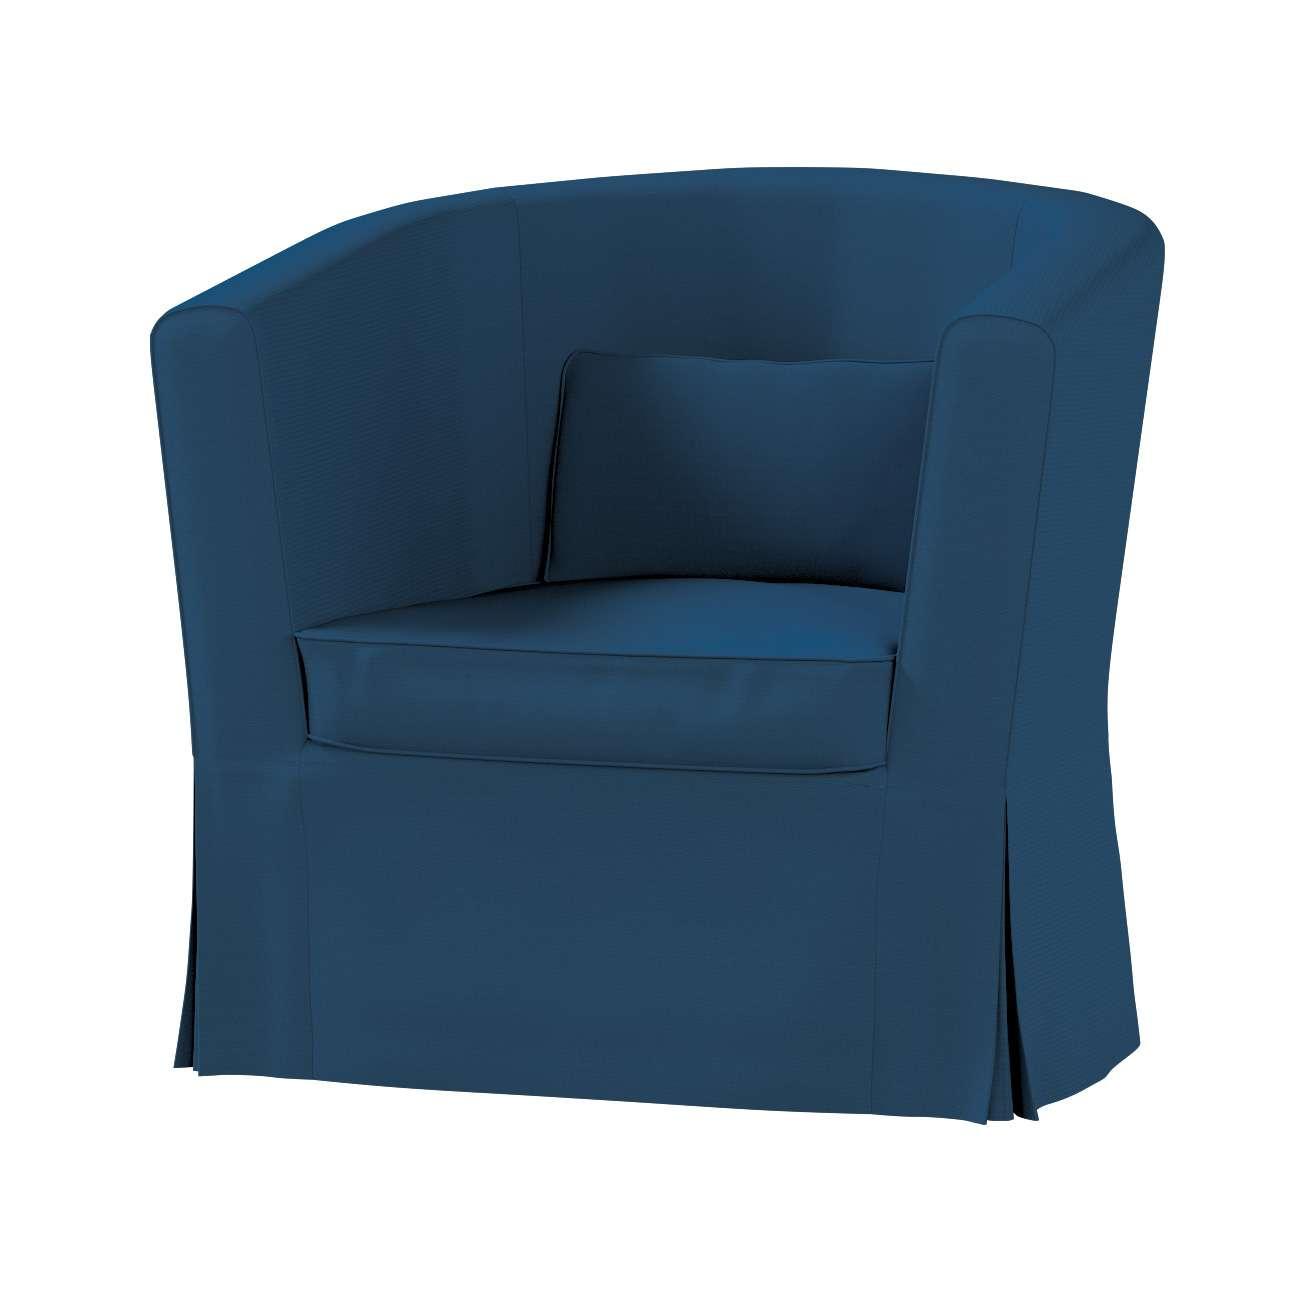 Ektorp Tullsta Sesselbezug Sesselhusse, Ektorp Tullsta von der Kollektion Cotton Panama, Stoff: 702-30